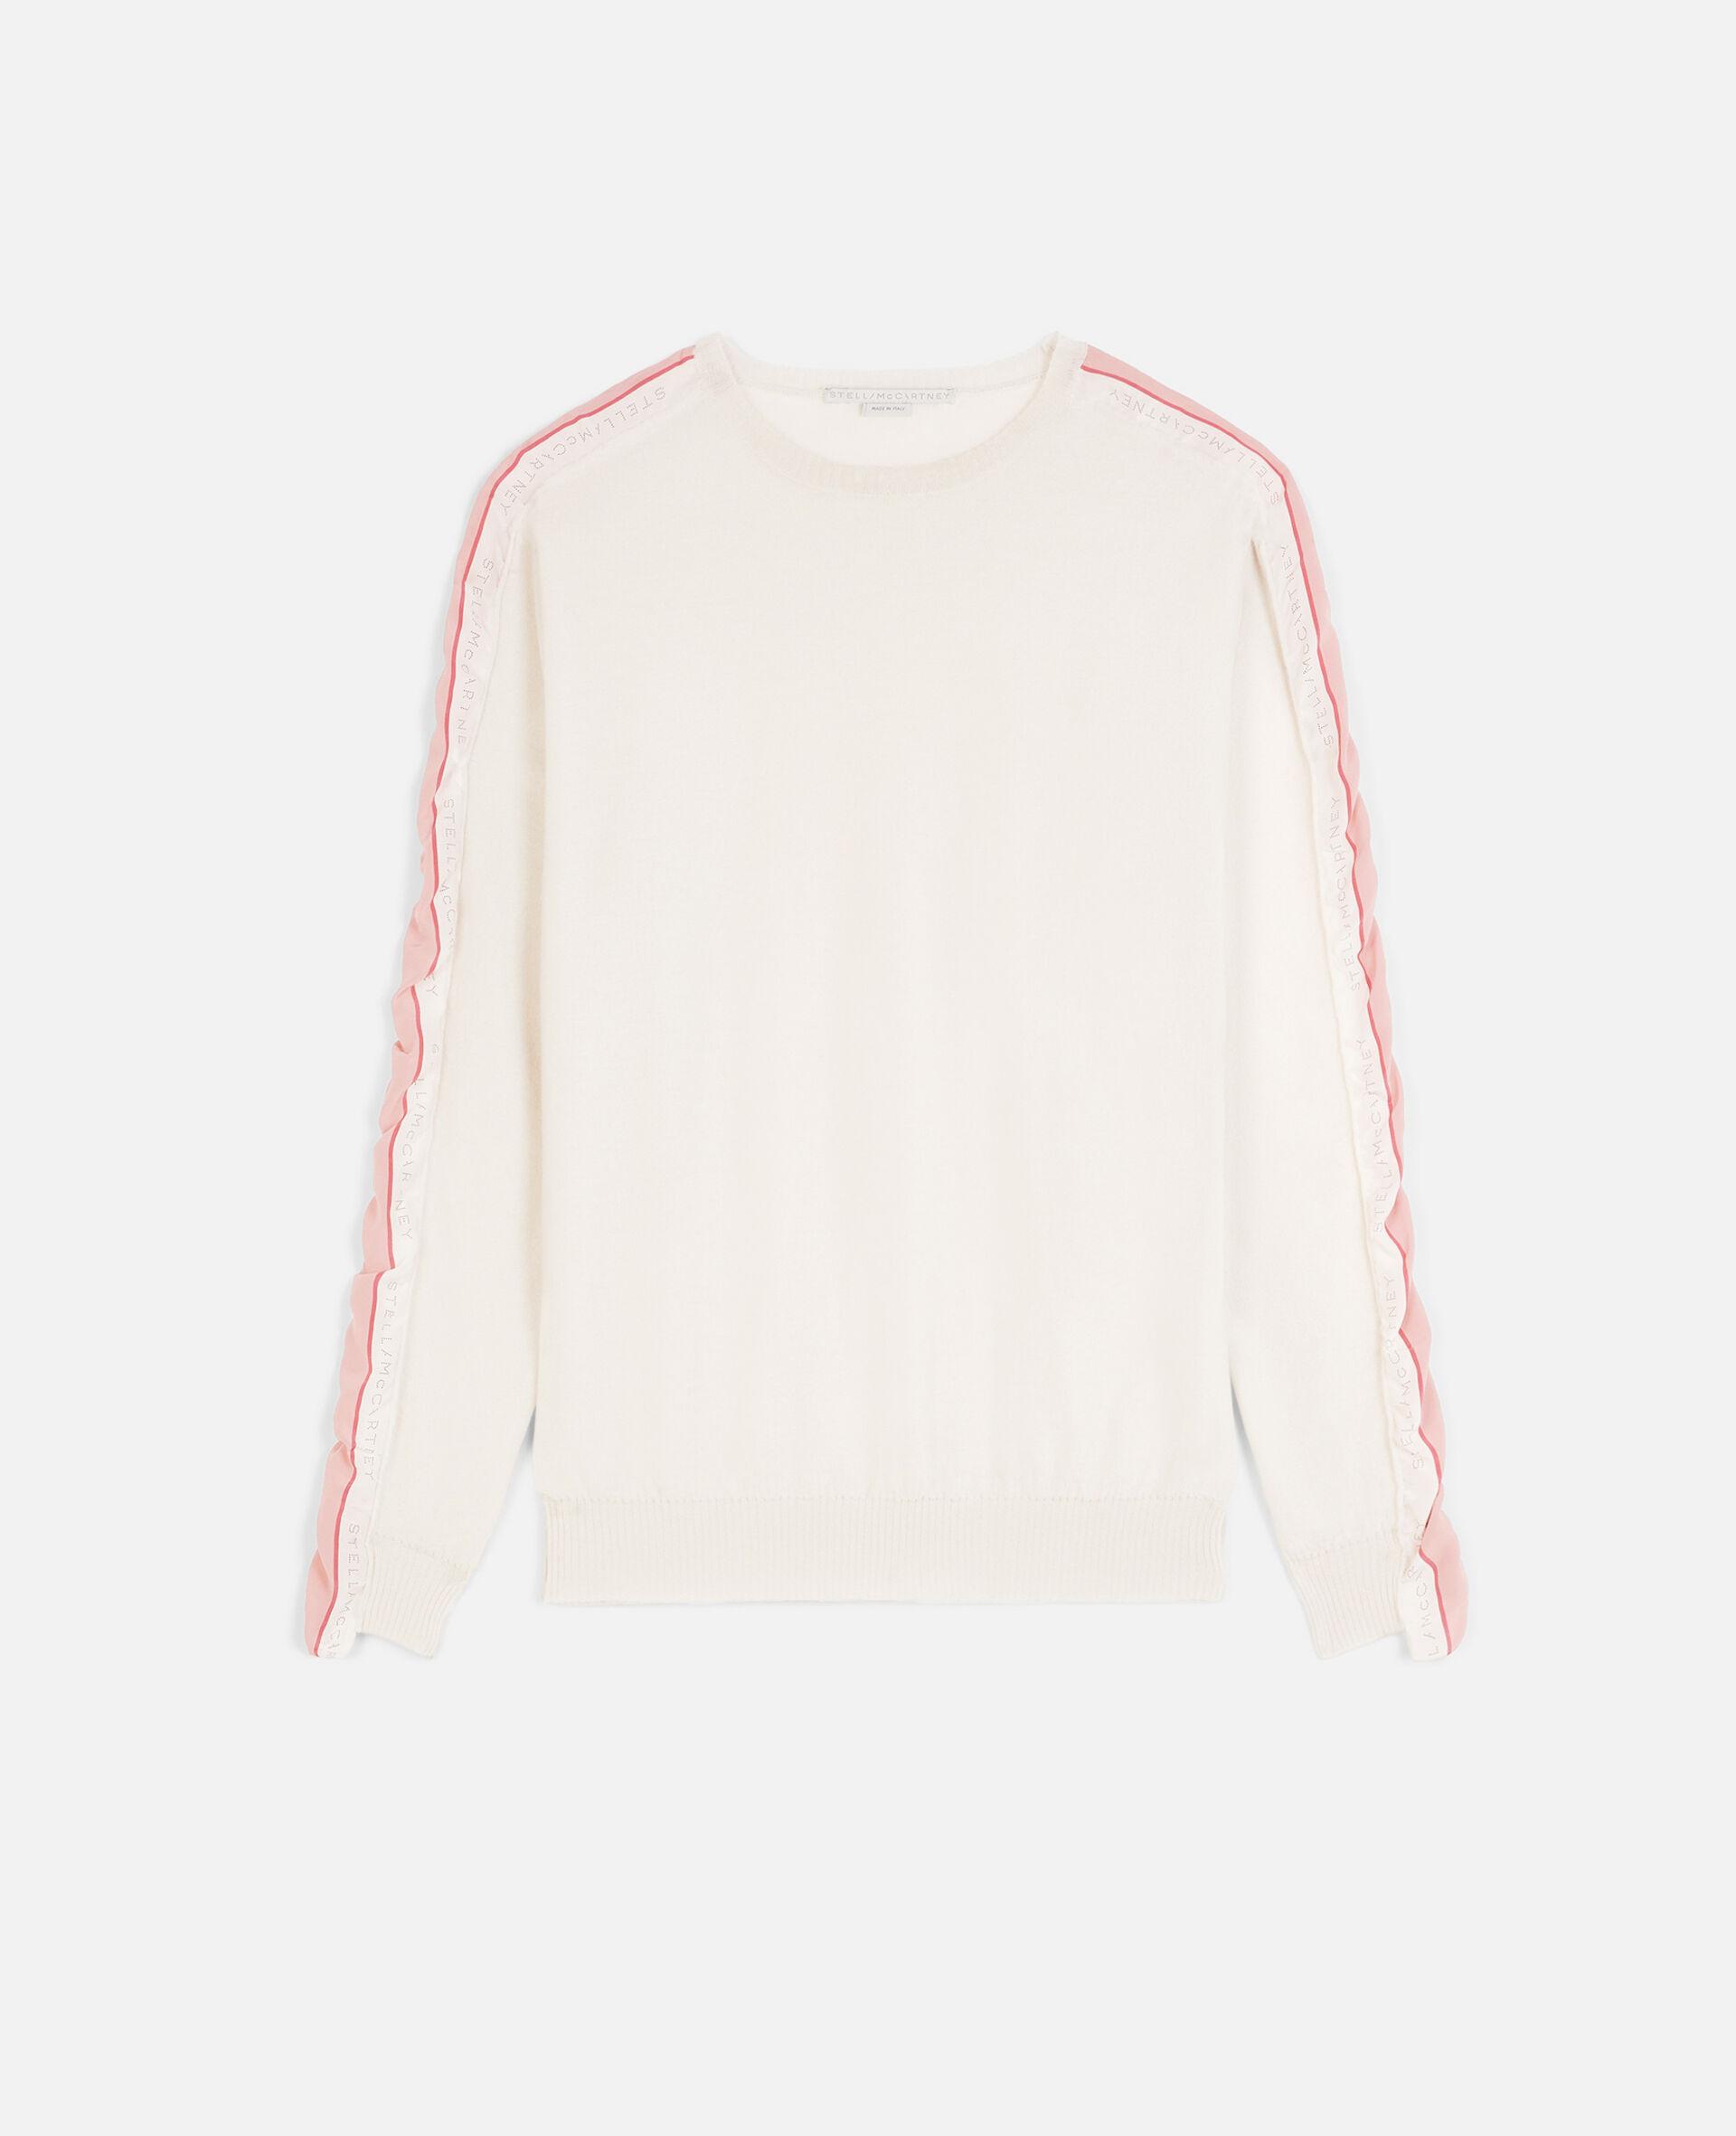 Monogram Wool Sweater-Beige-large image number 0